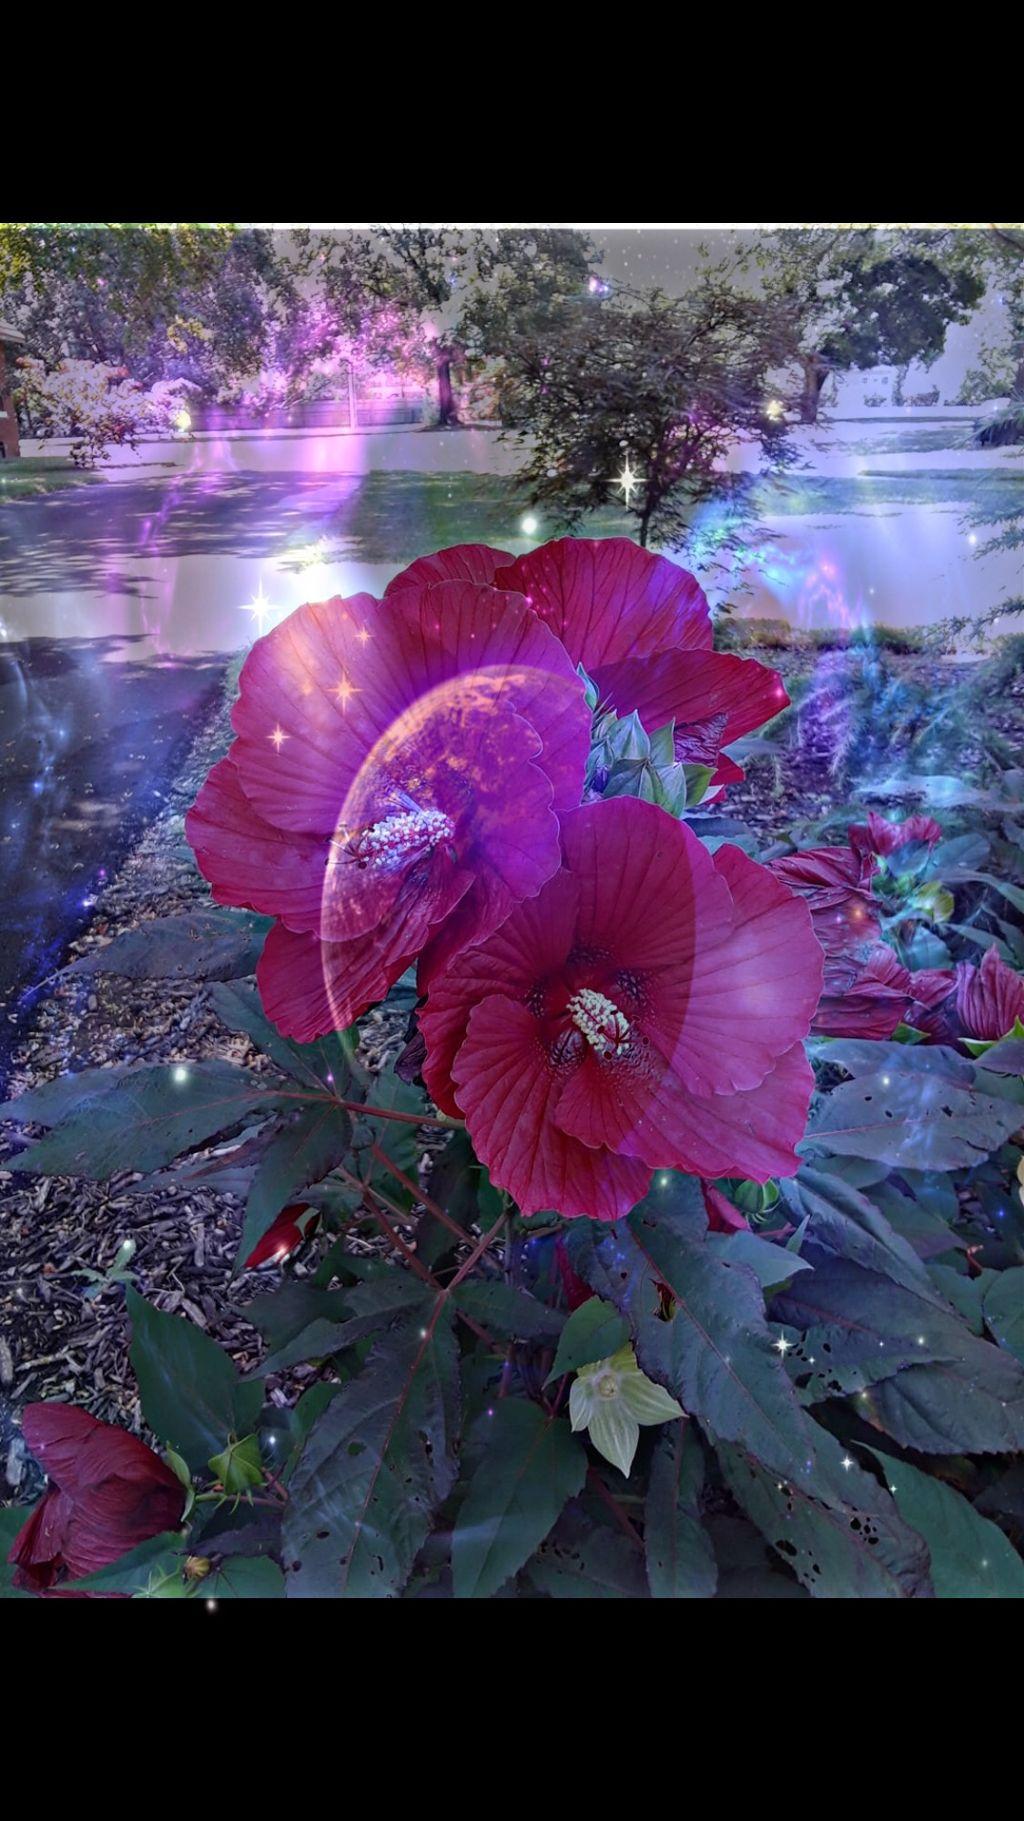 #freetoedit #doubleexposure #remixed #flowers #galaxy #moon #stars #beautiful